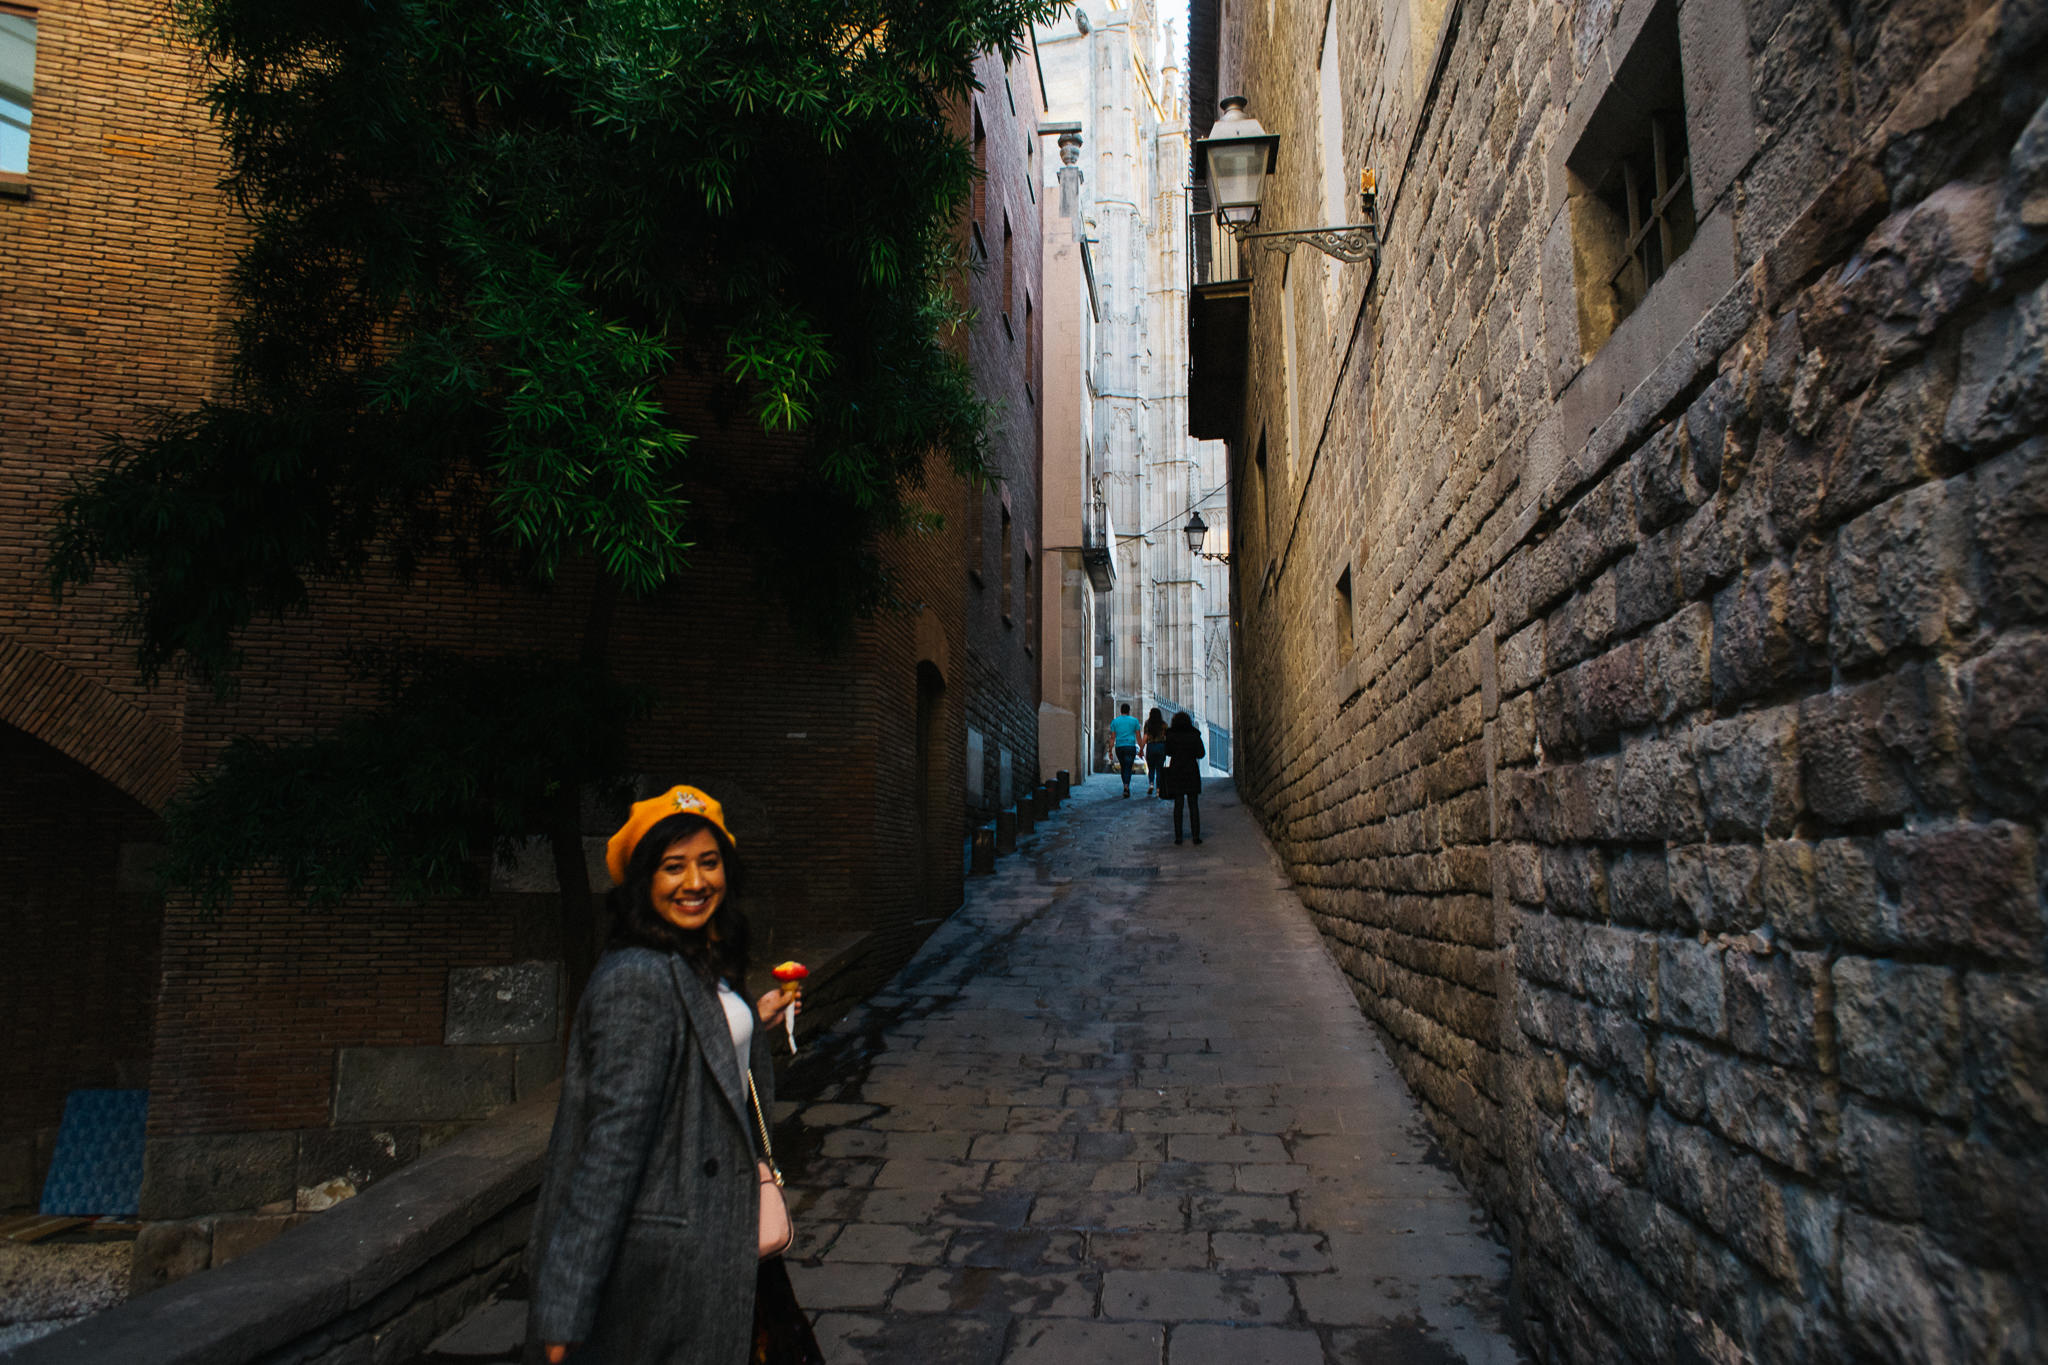 Barcelona-destination-photographer-alfred-tang-18.jpg